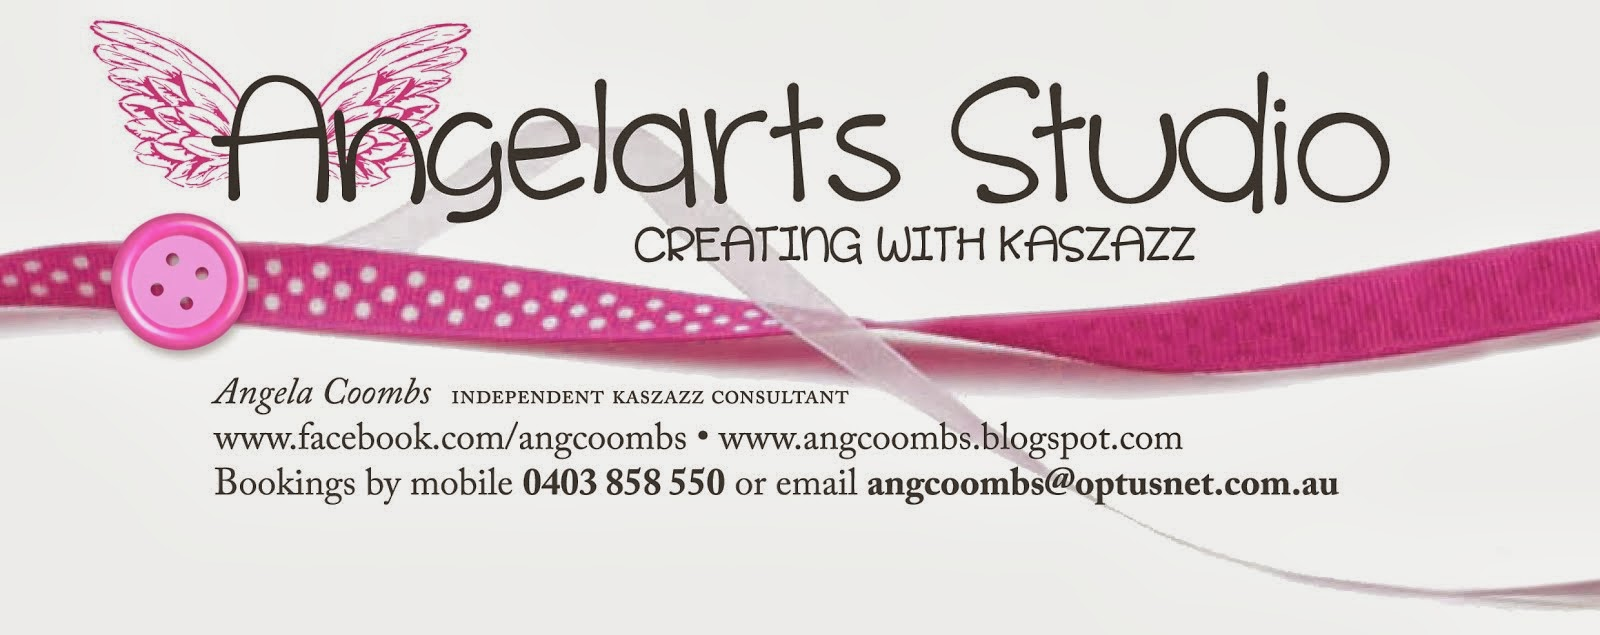 Angelarts Studio